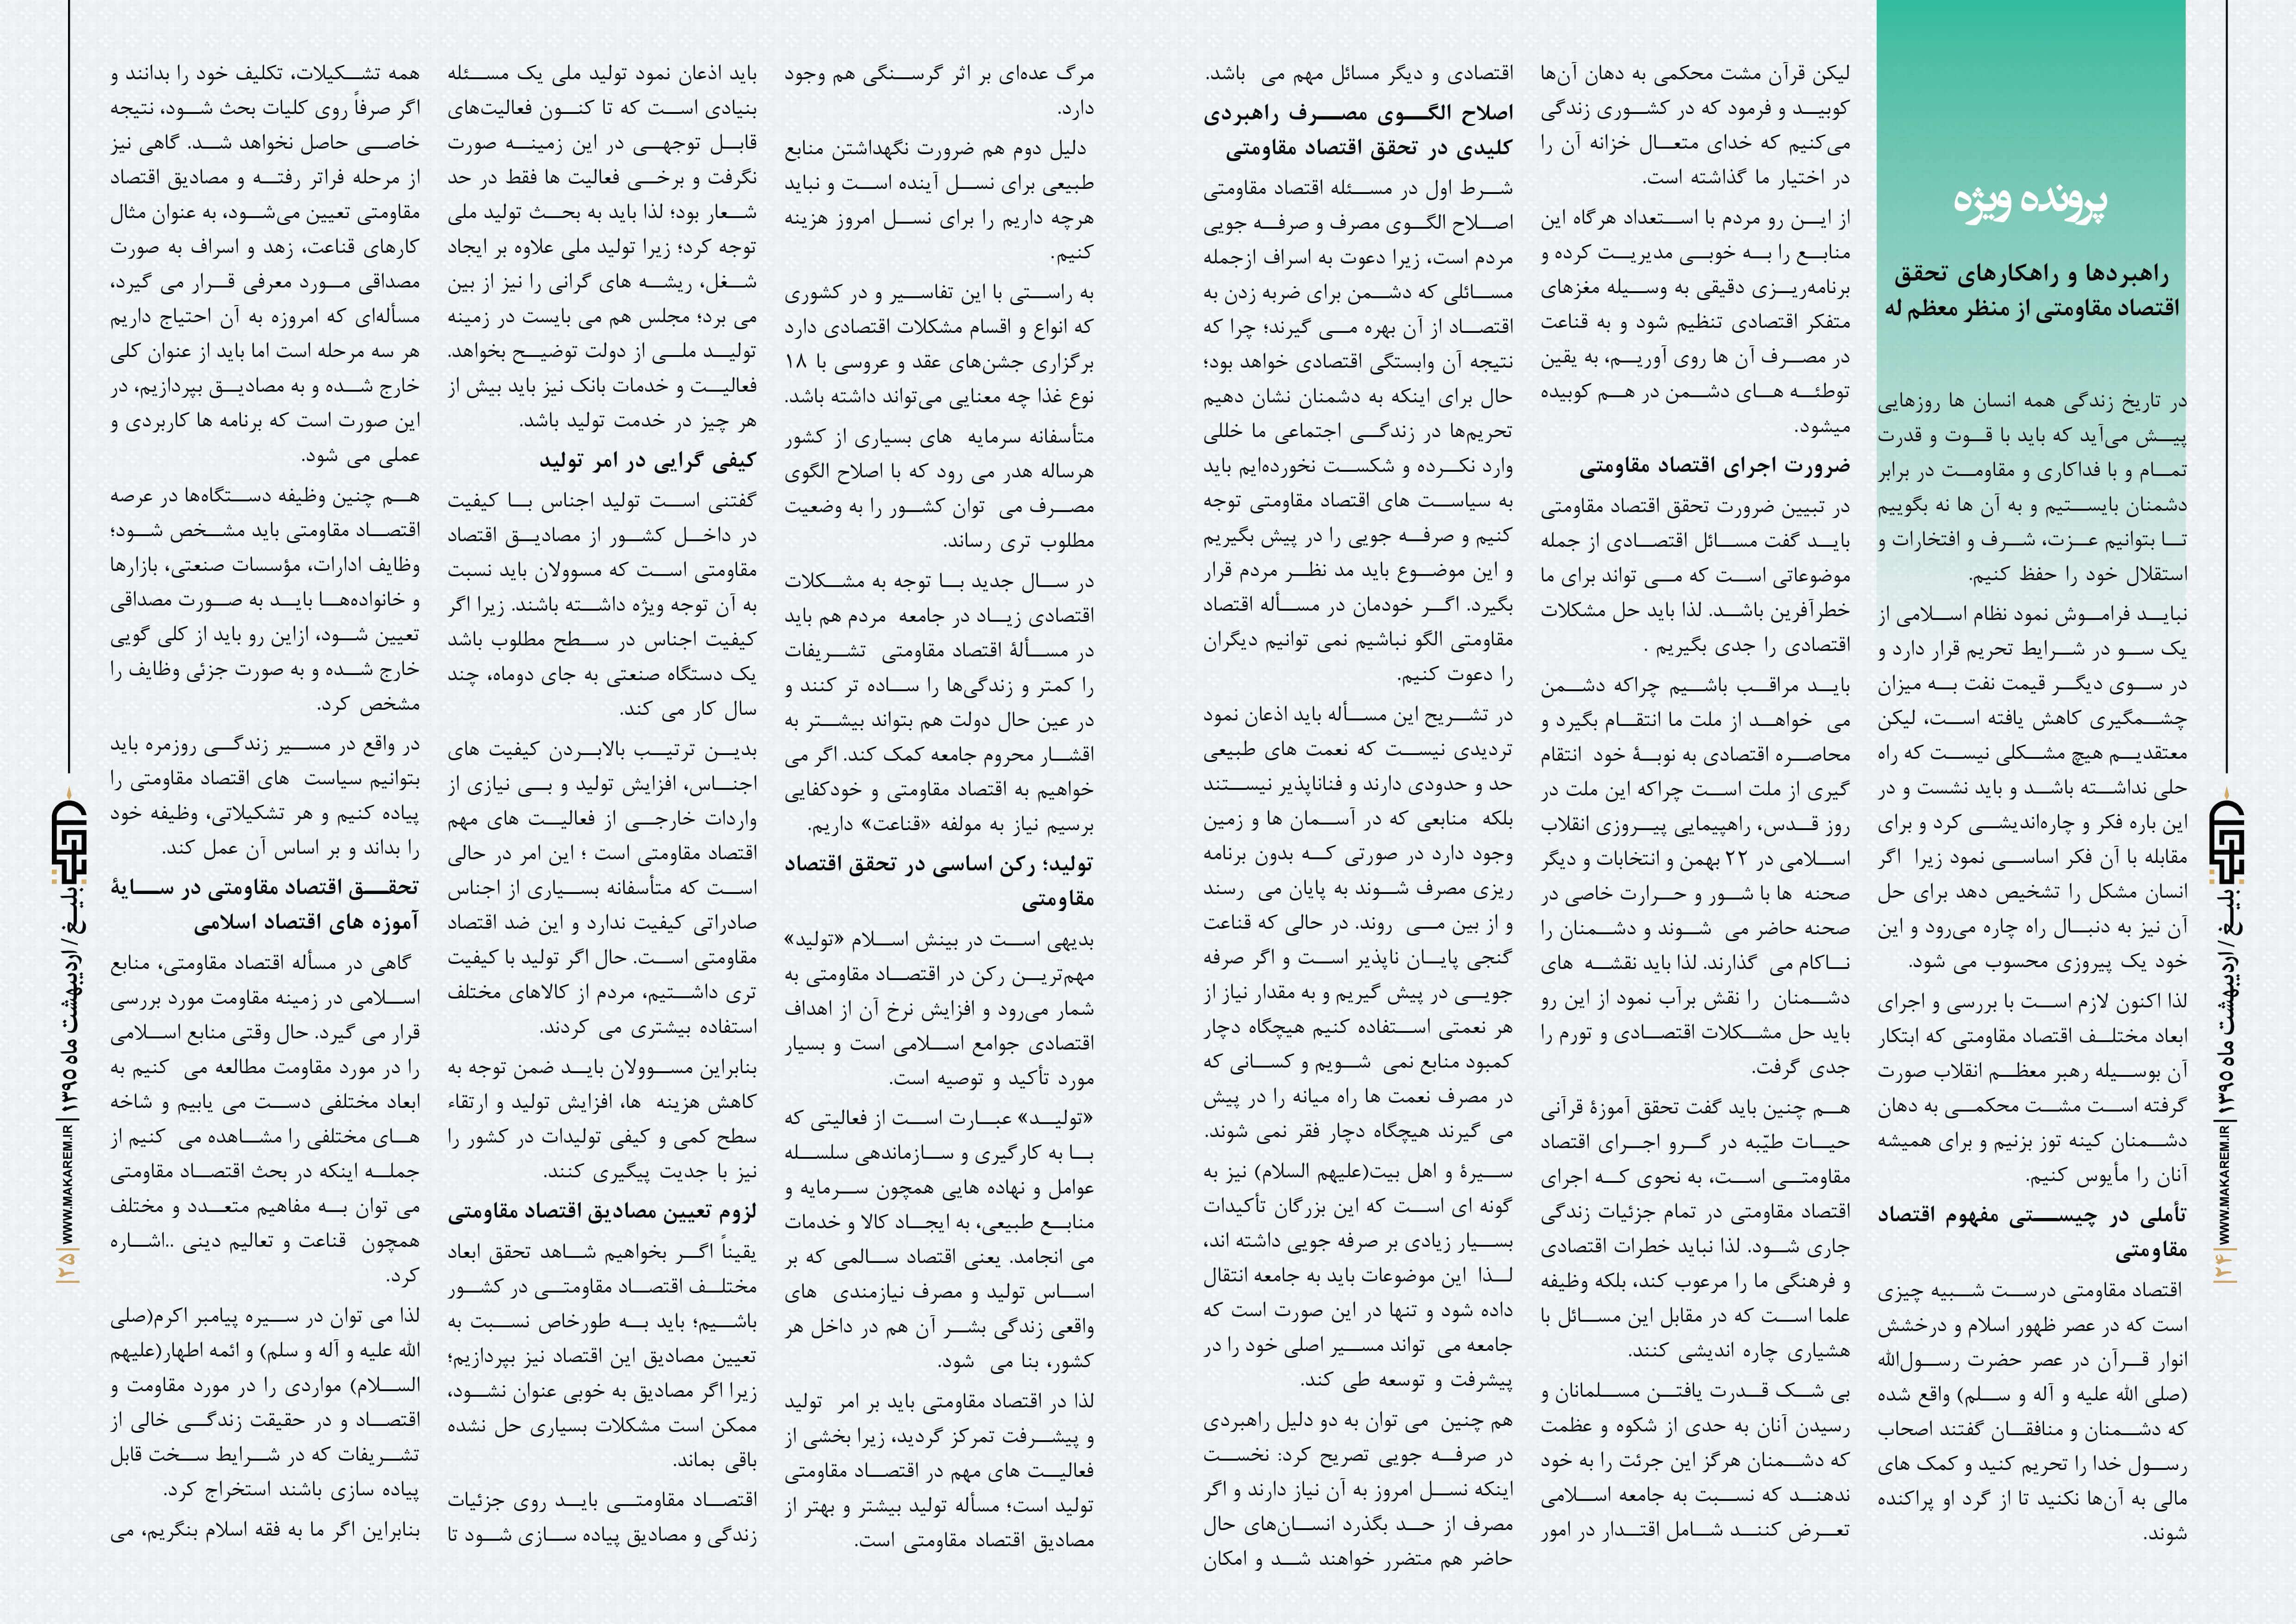 13-مدرسه الامام امیر المومنین (ع)